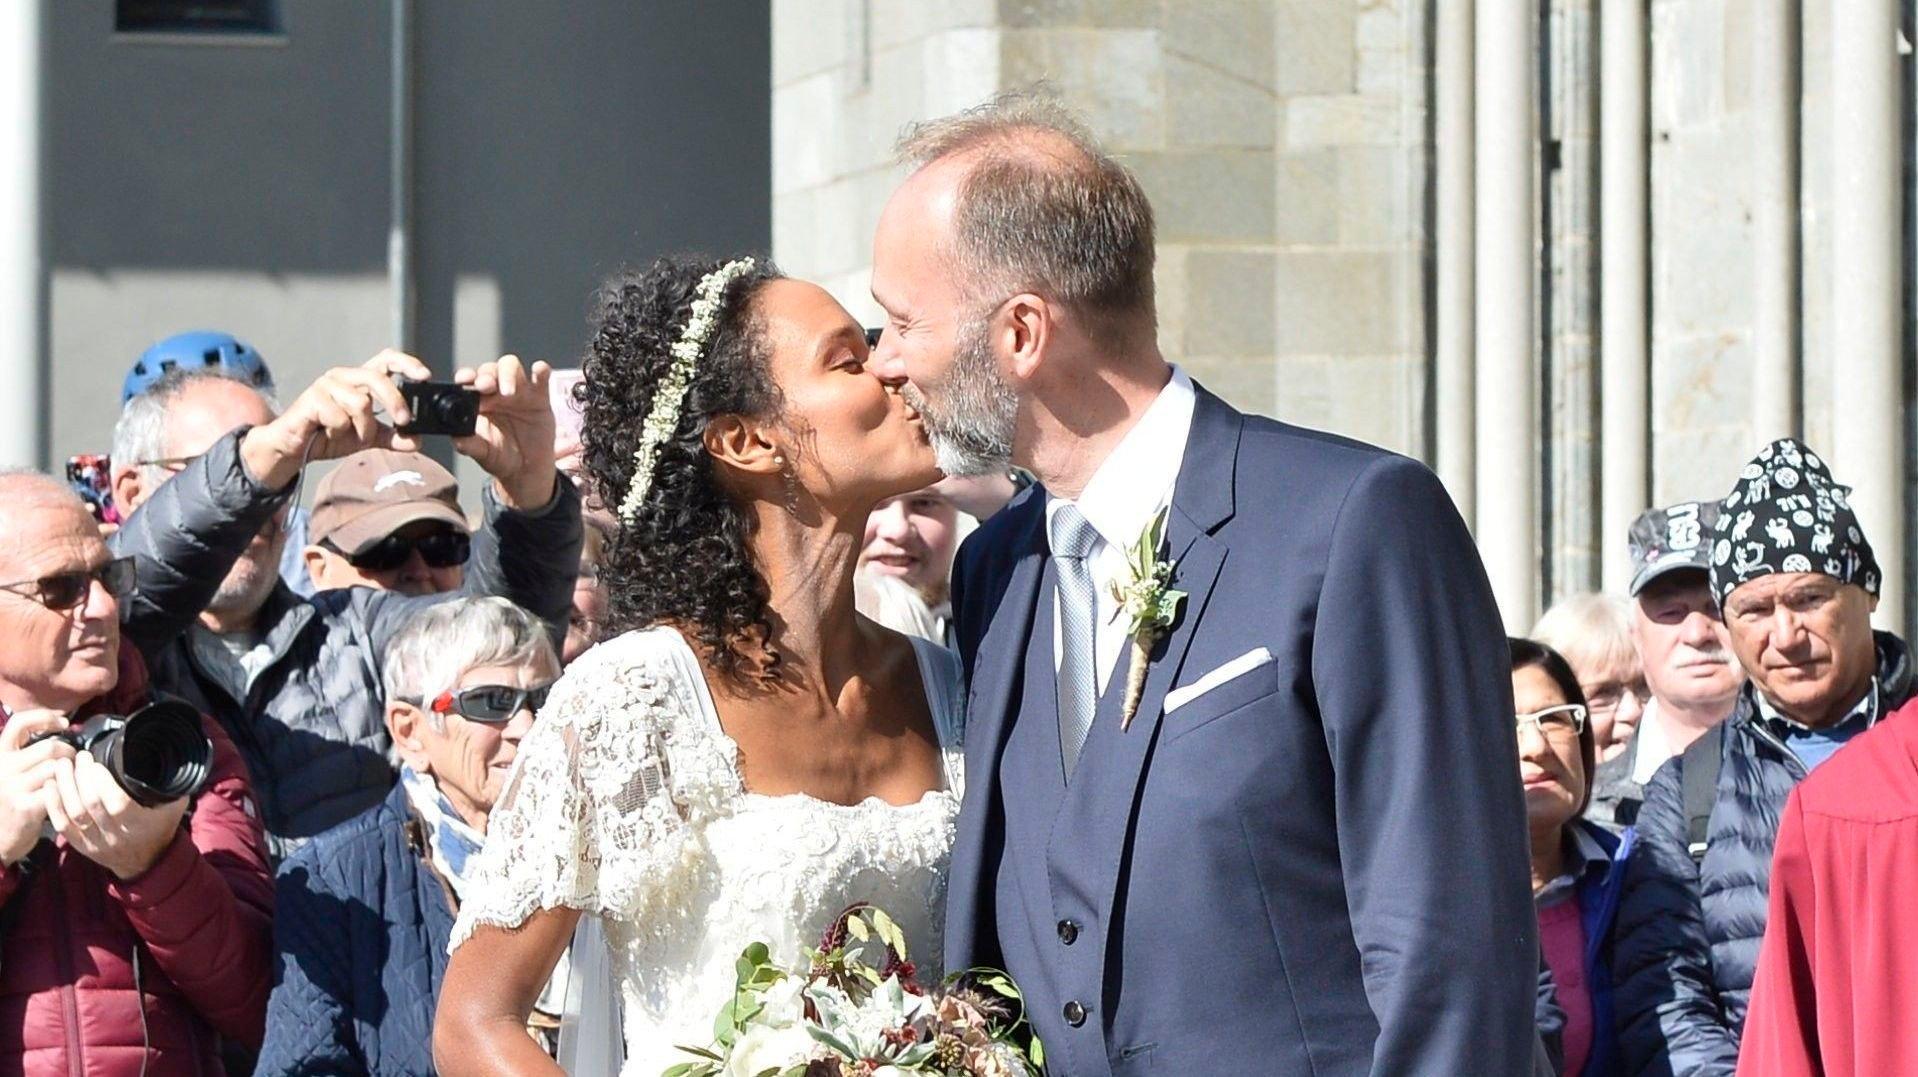 Trond giske bryllup